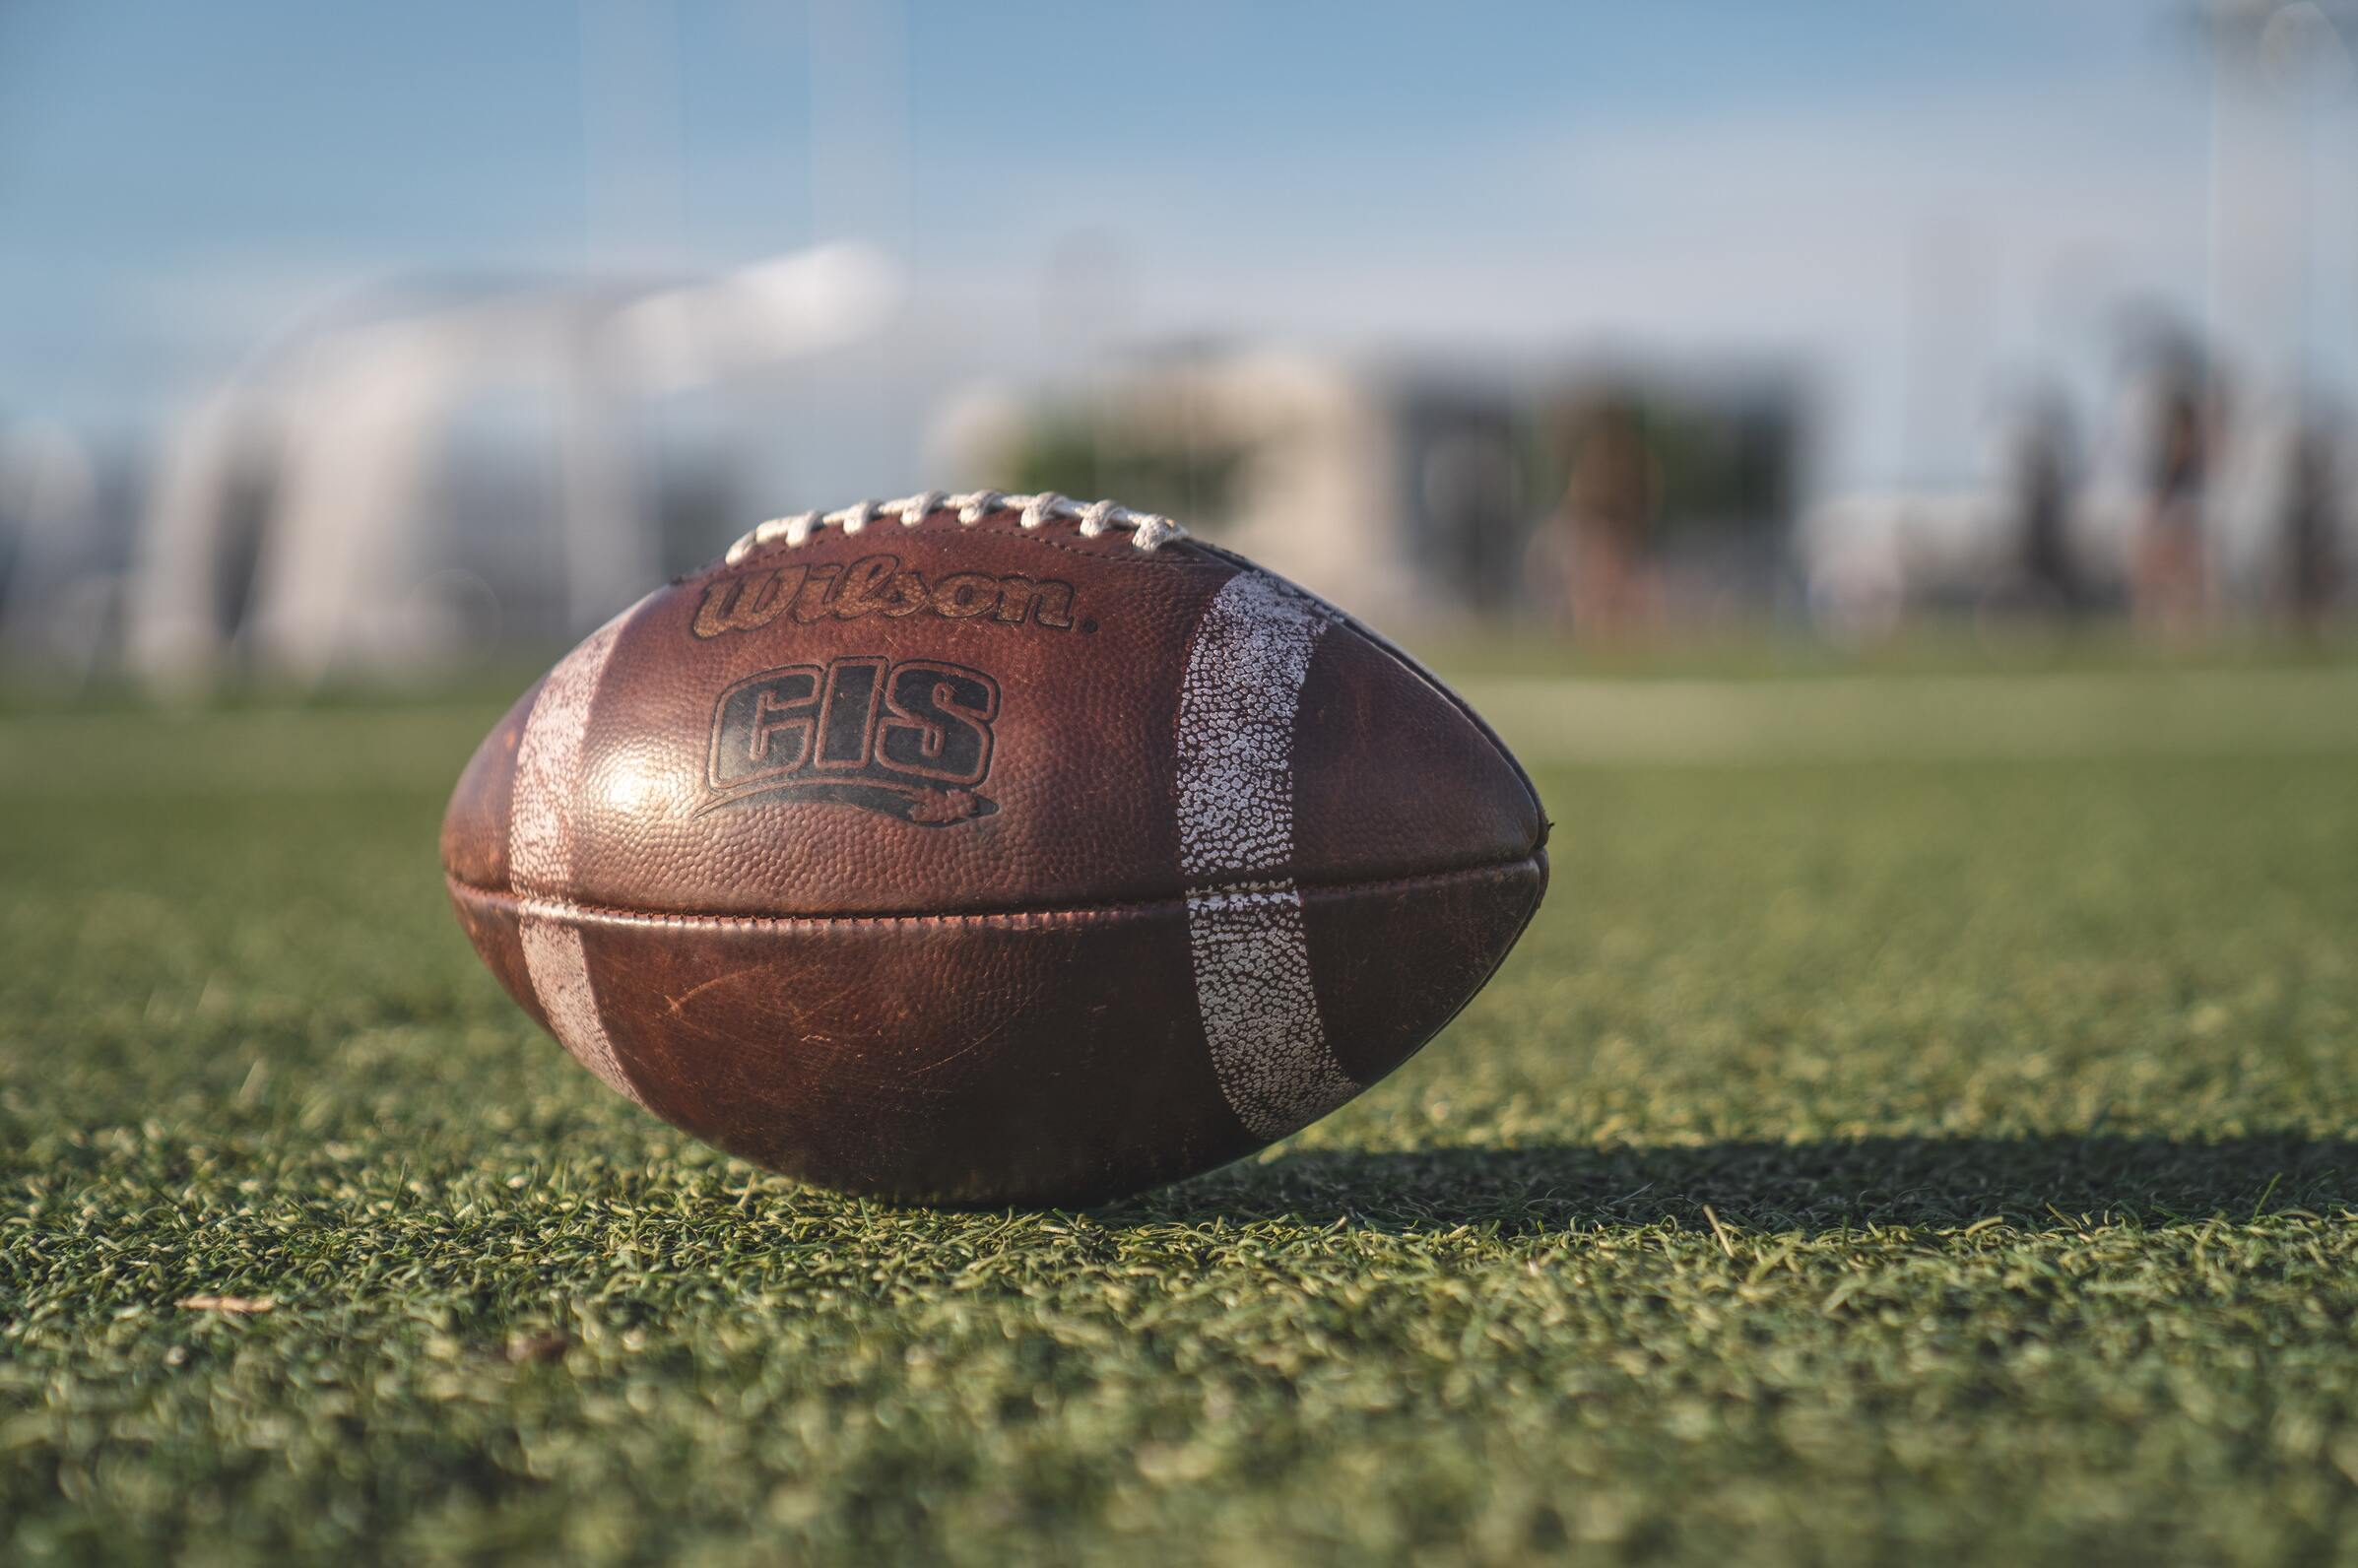 A football sitting on a football field